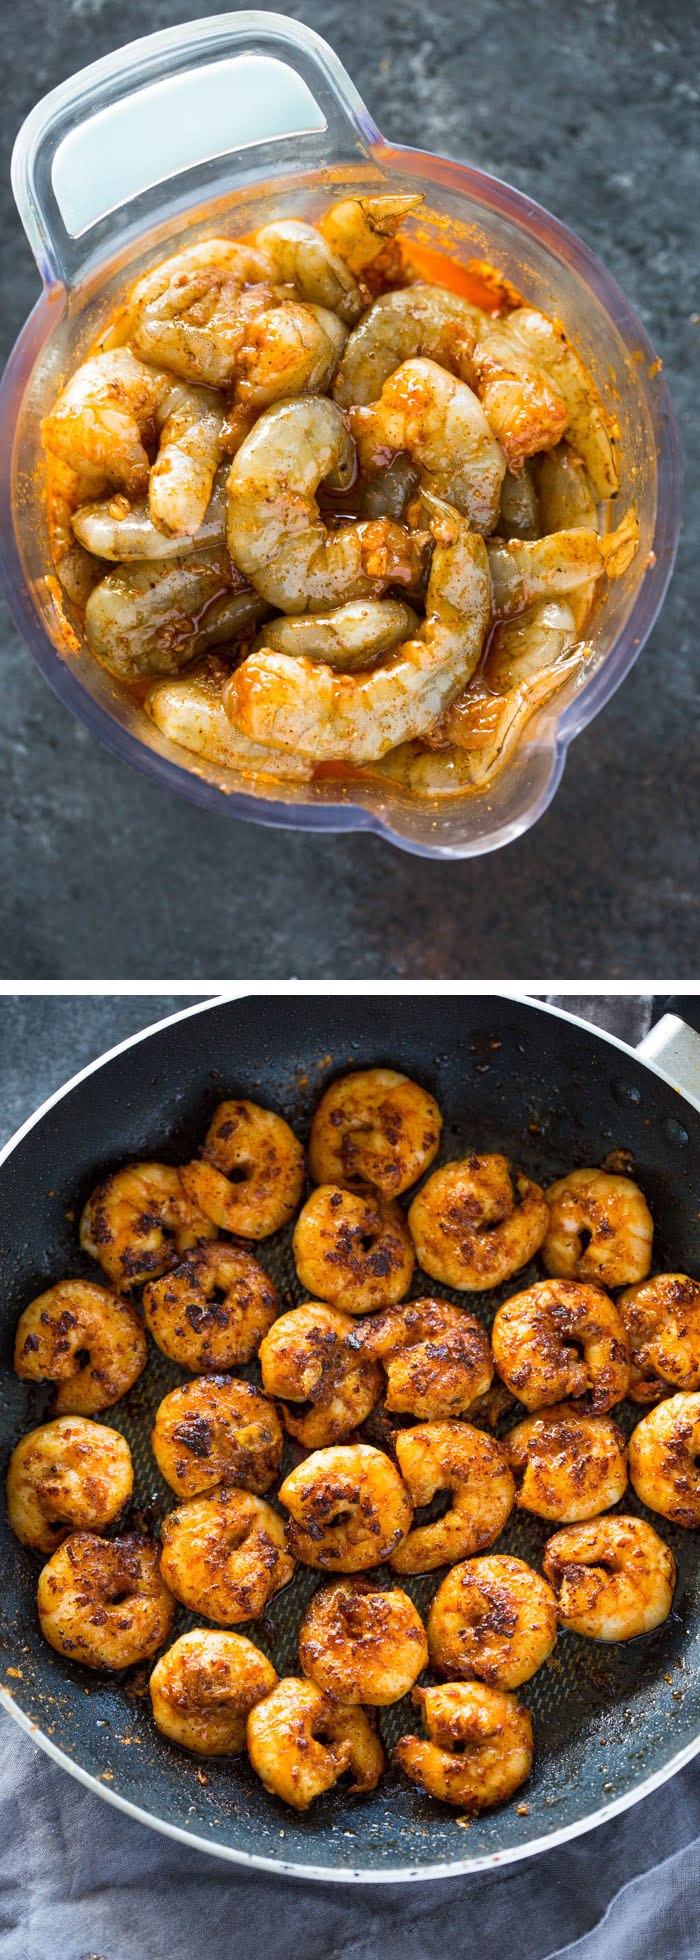 The Best 10 Minute Cajun Blackened Shrimp